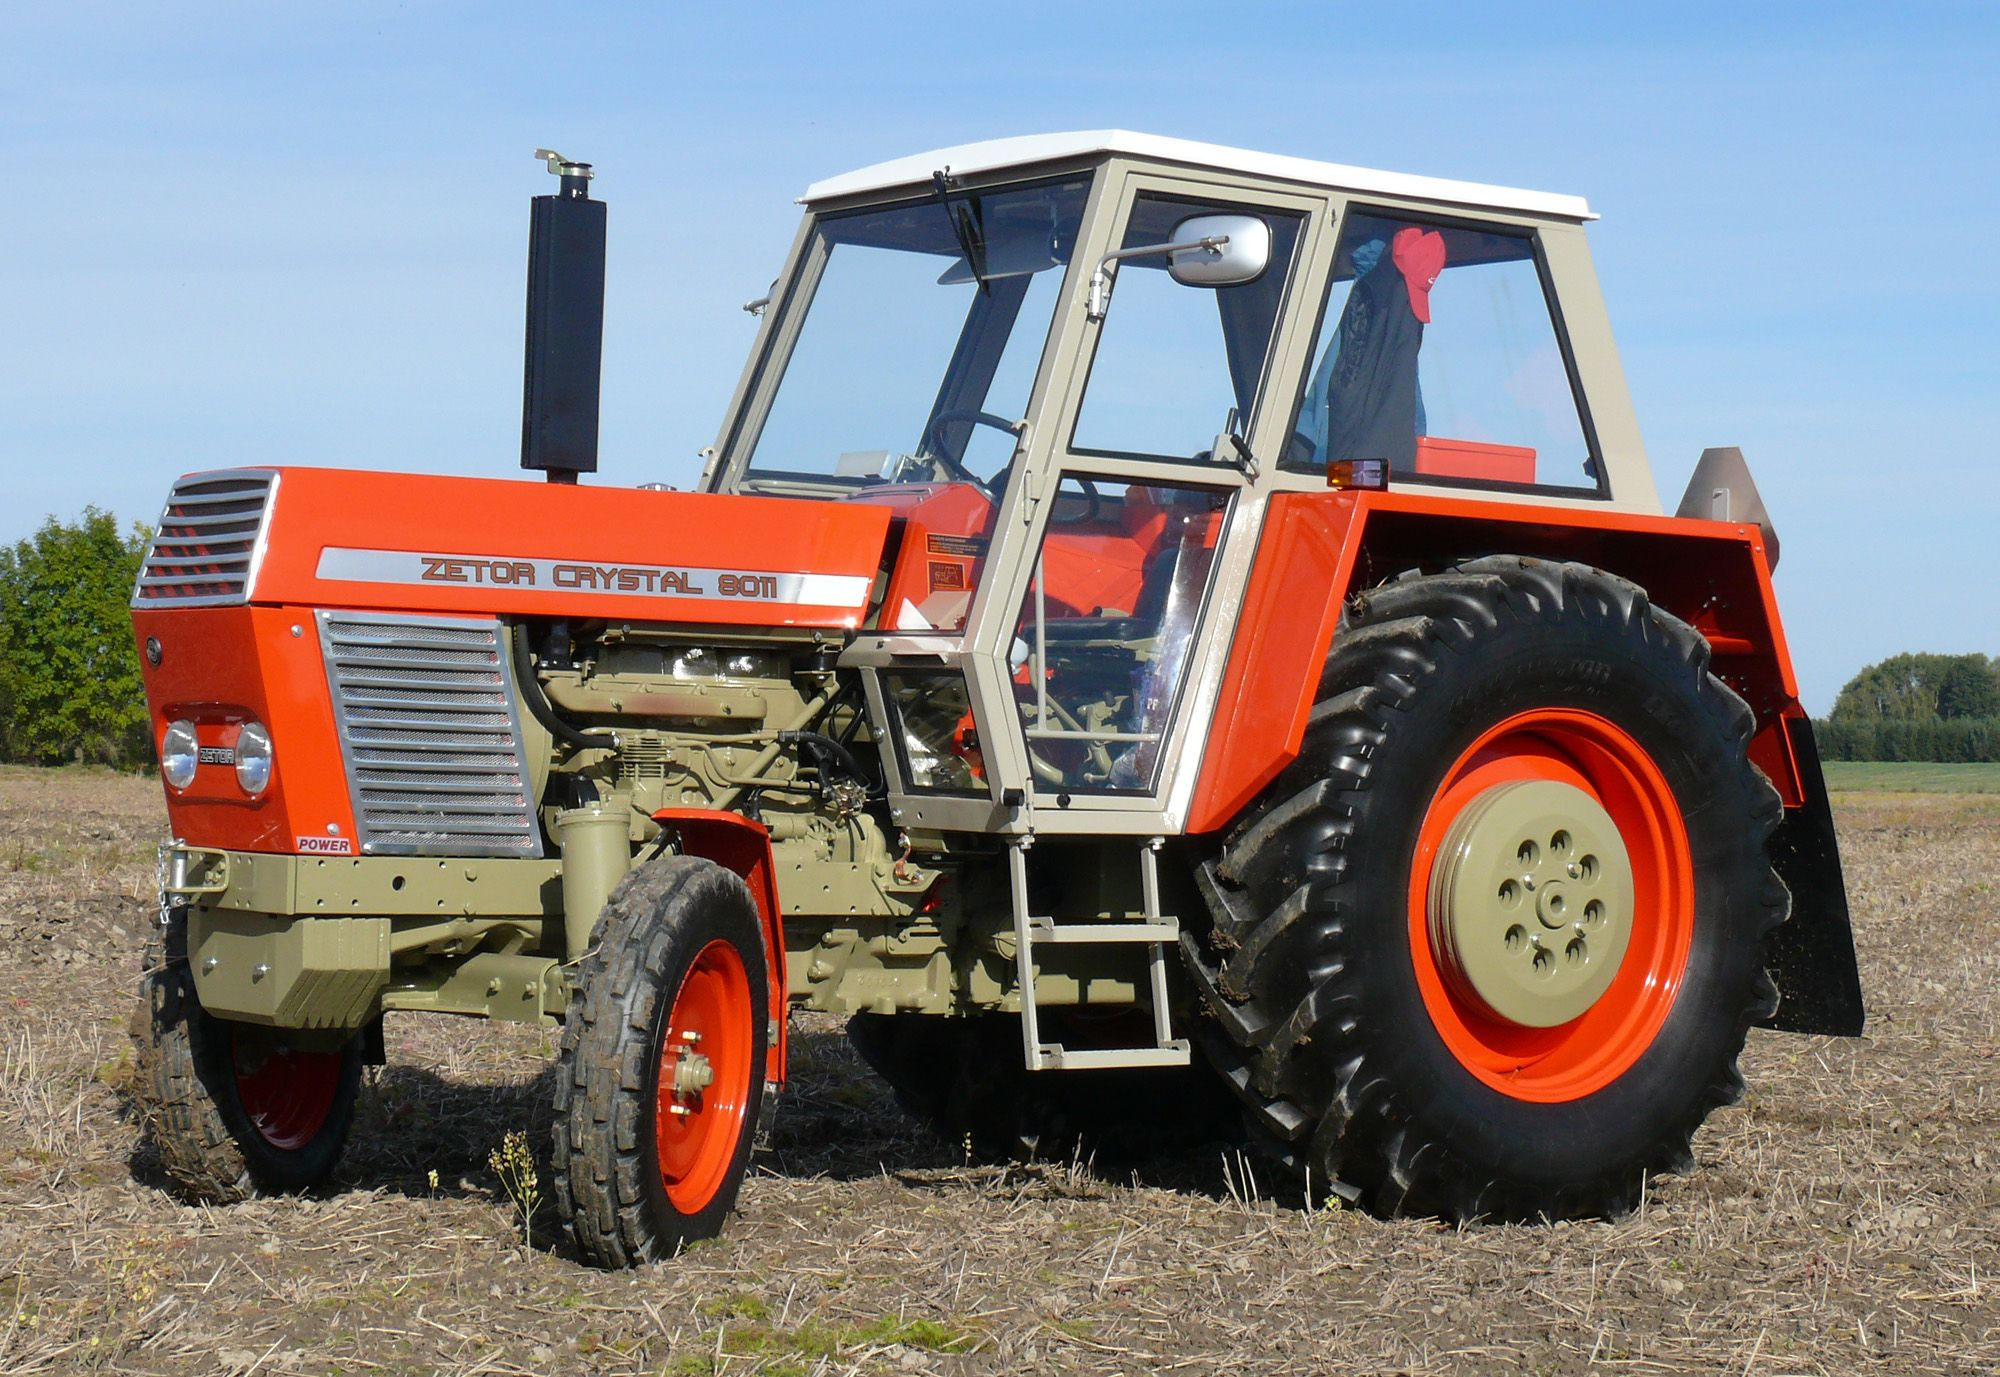 zetor crystal 8011 tractor mania pinterest crystals rh pinterest com Zetor John Deere New Holland Tractors